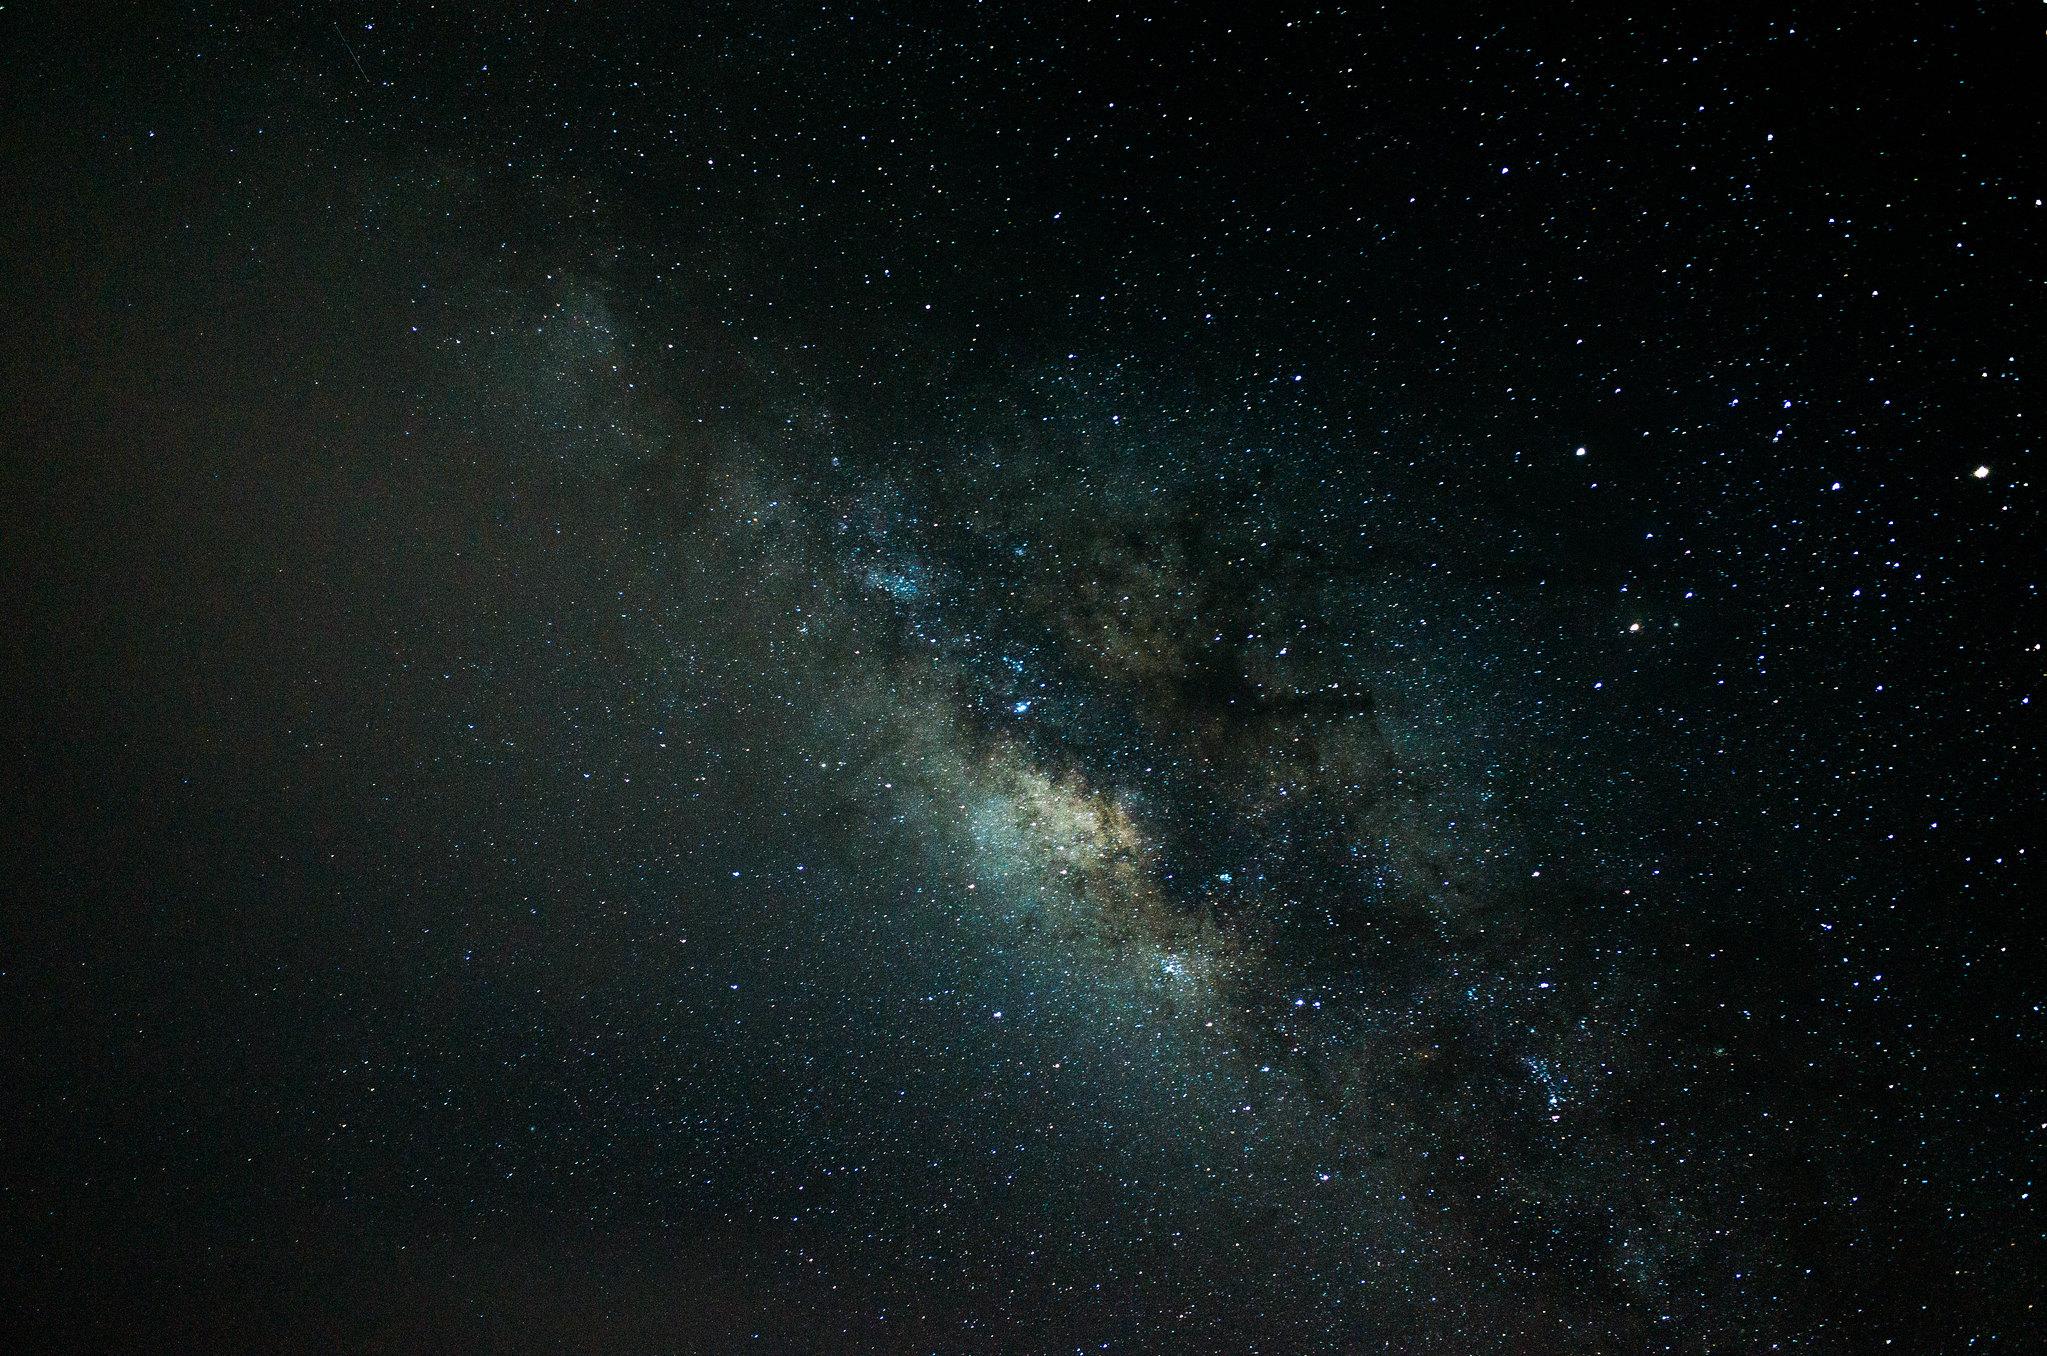 Ricoh GR銀河